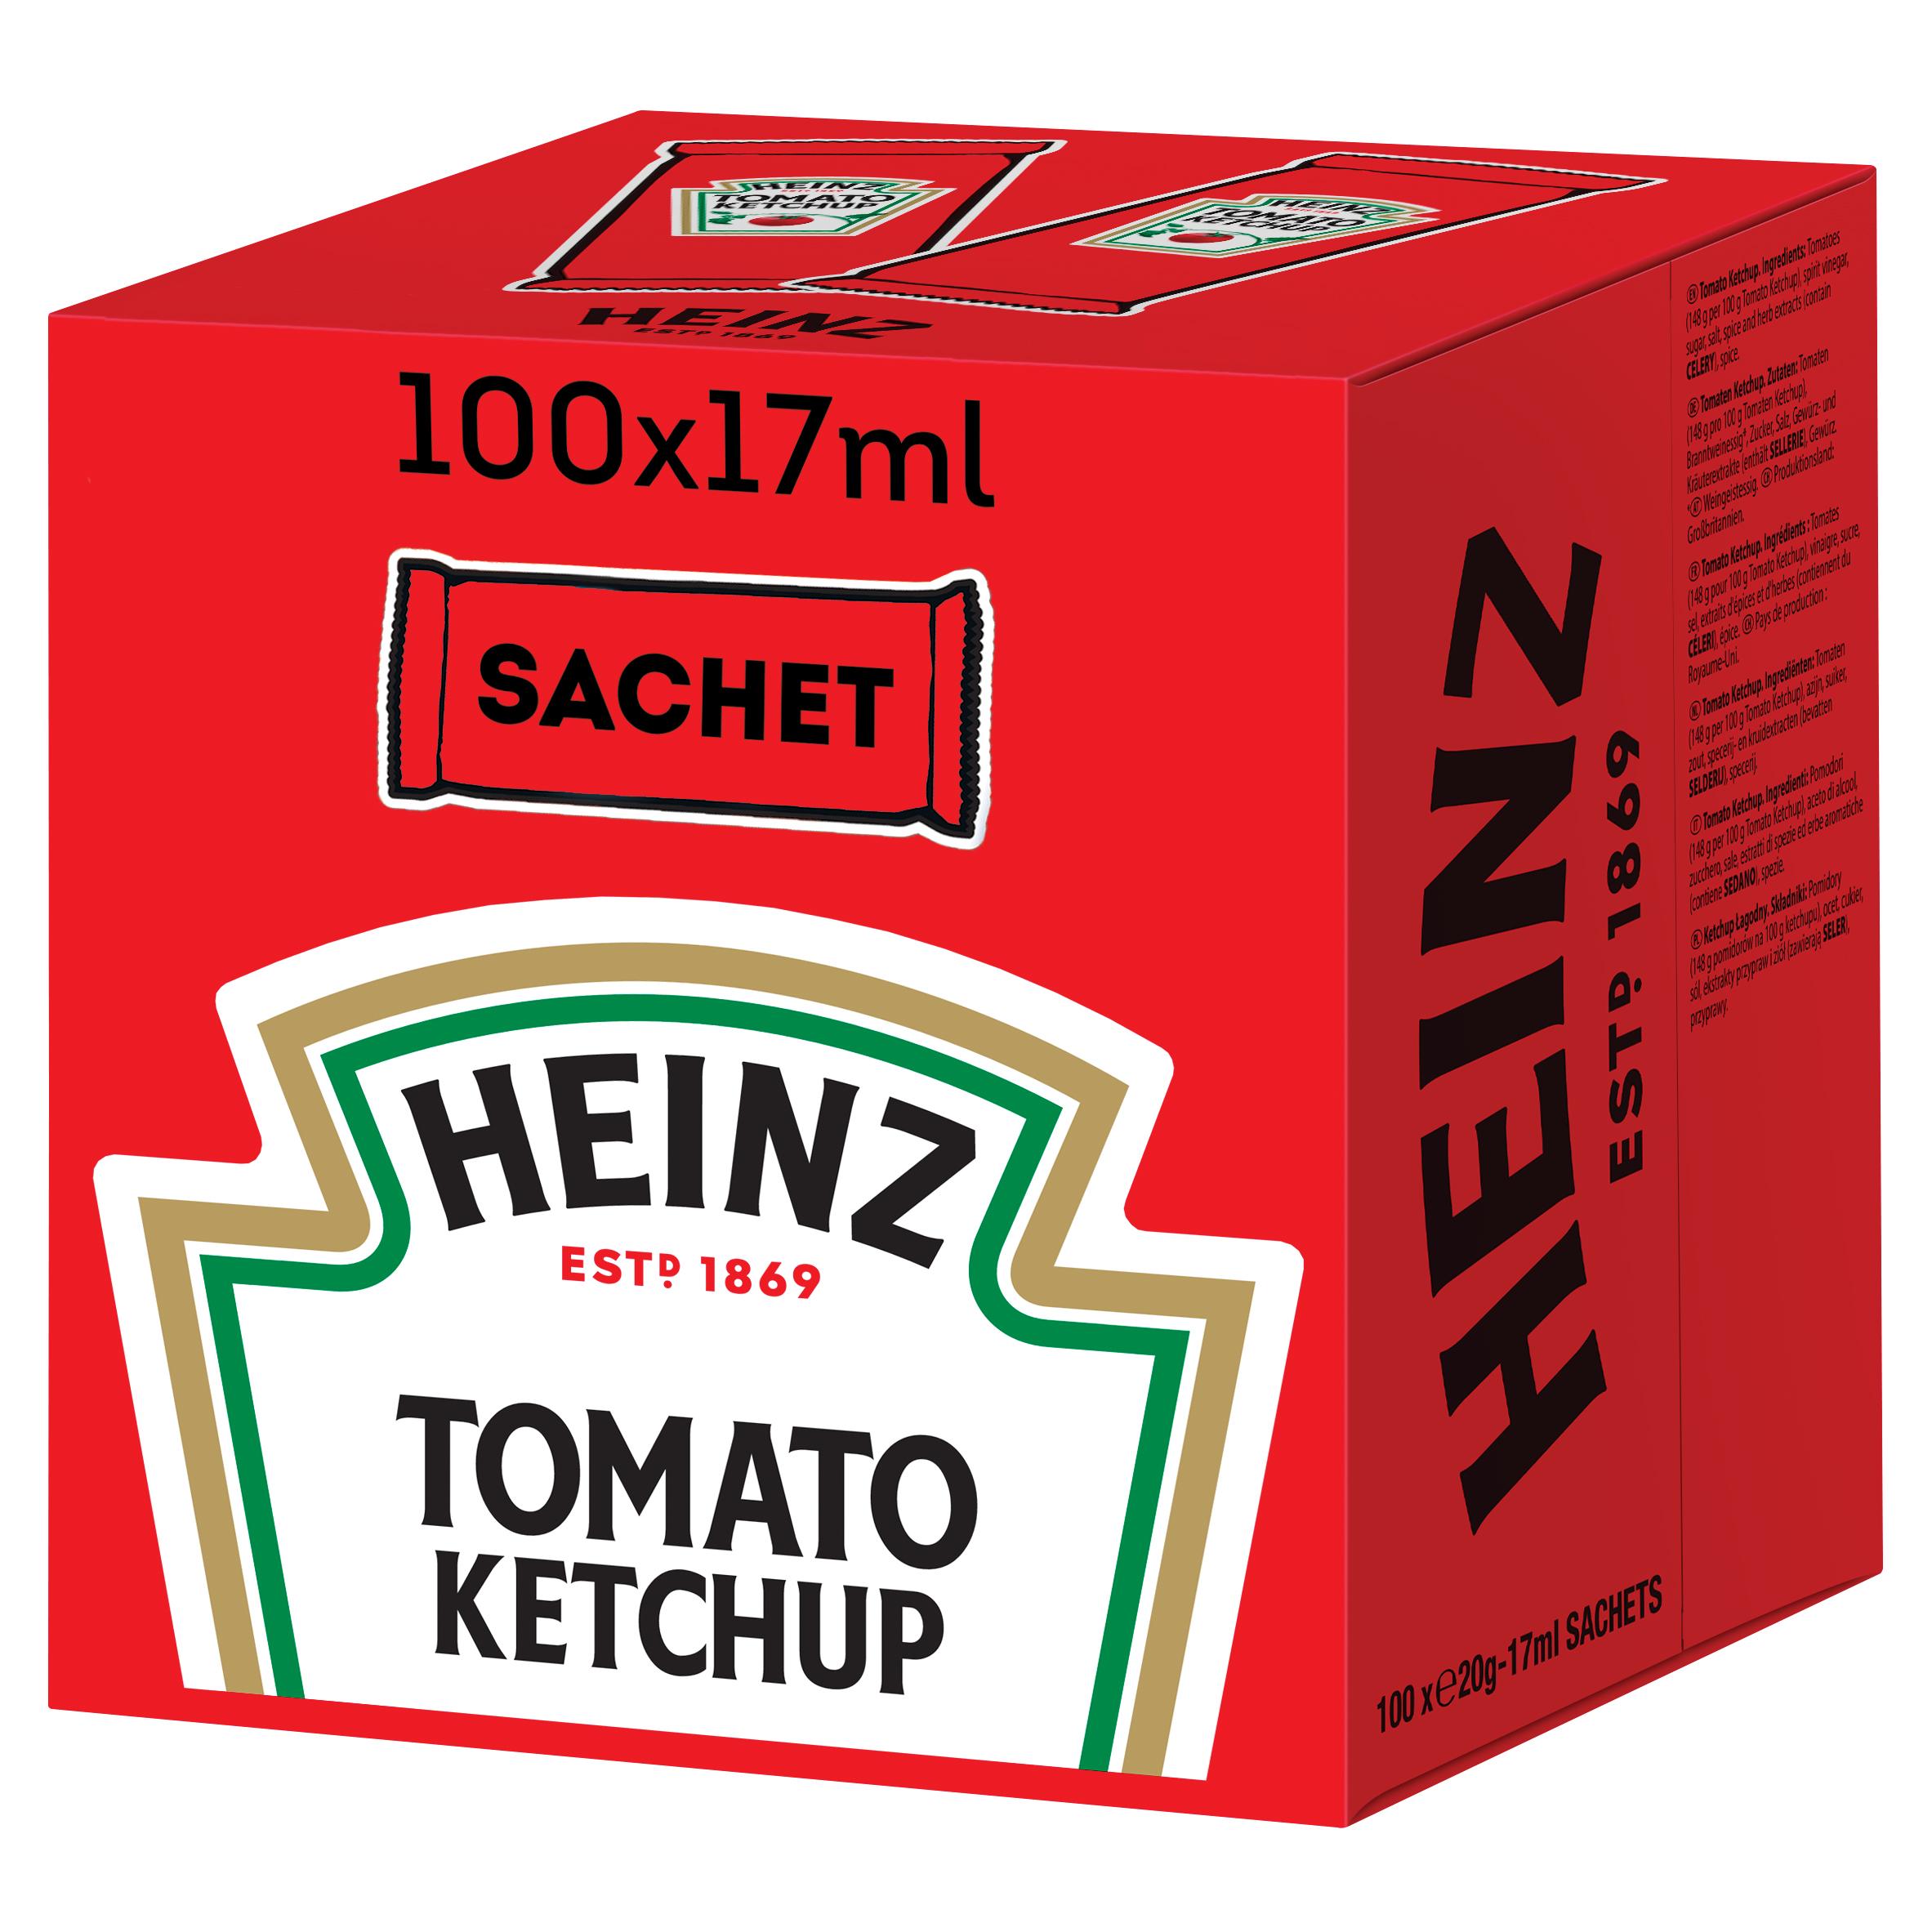 Heinz Tomato Ketchup sachet 17ml